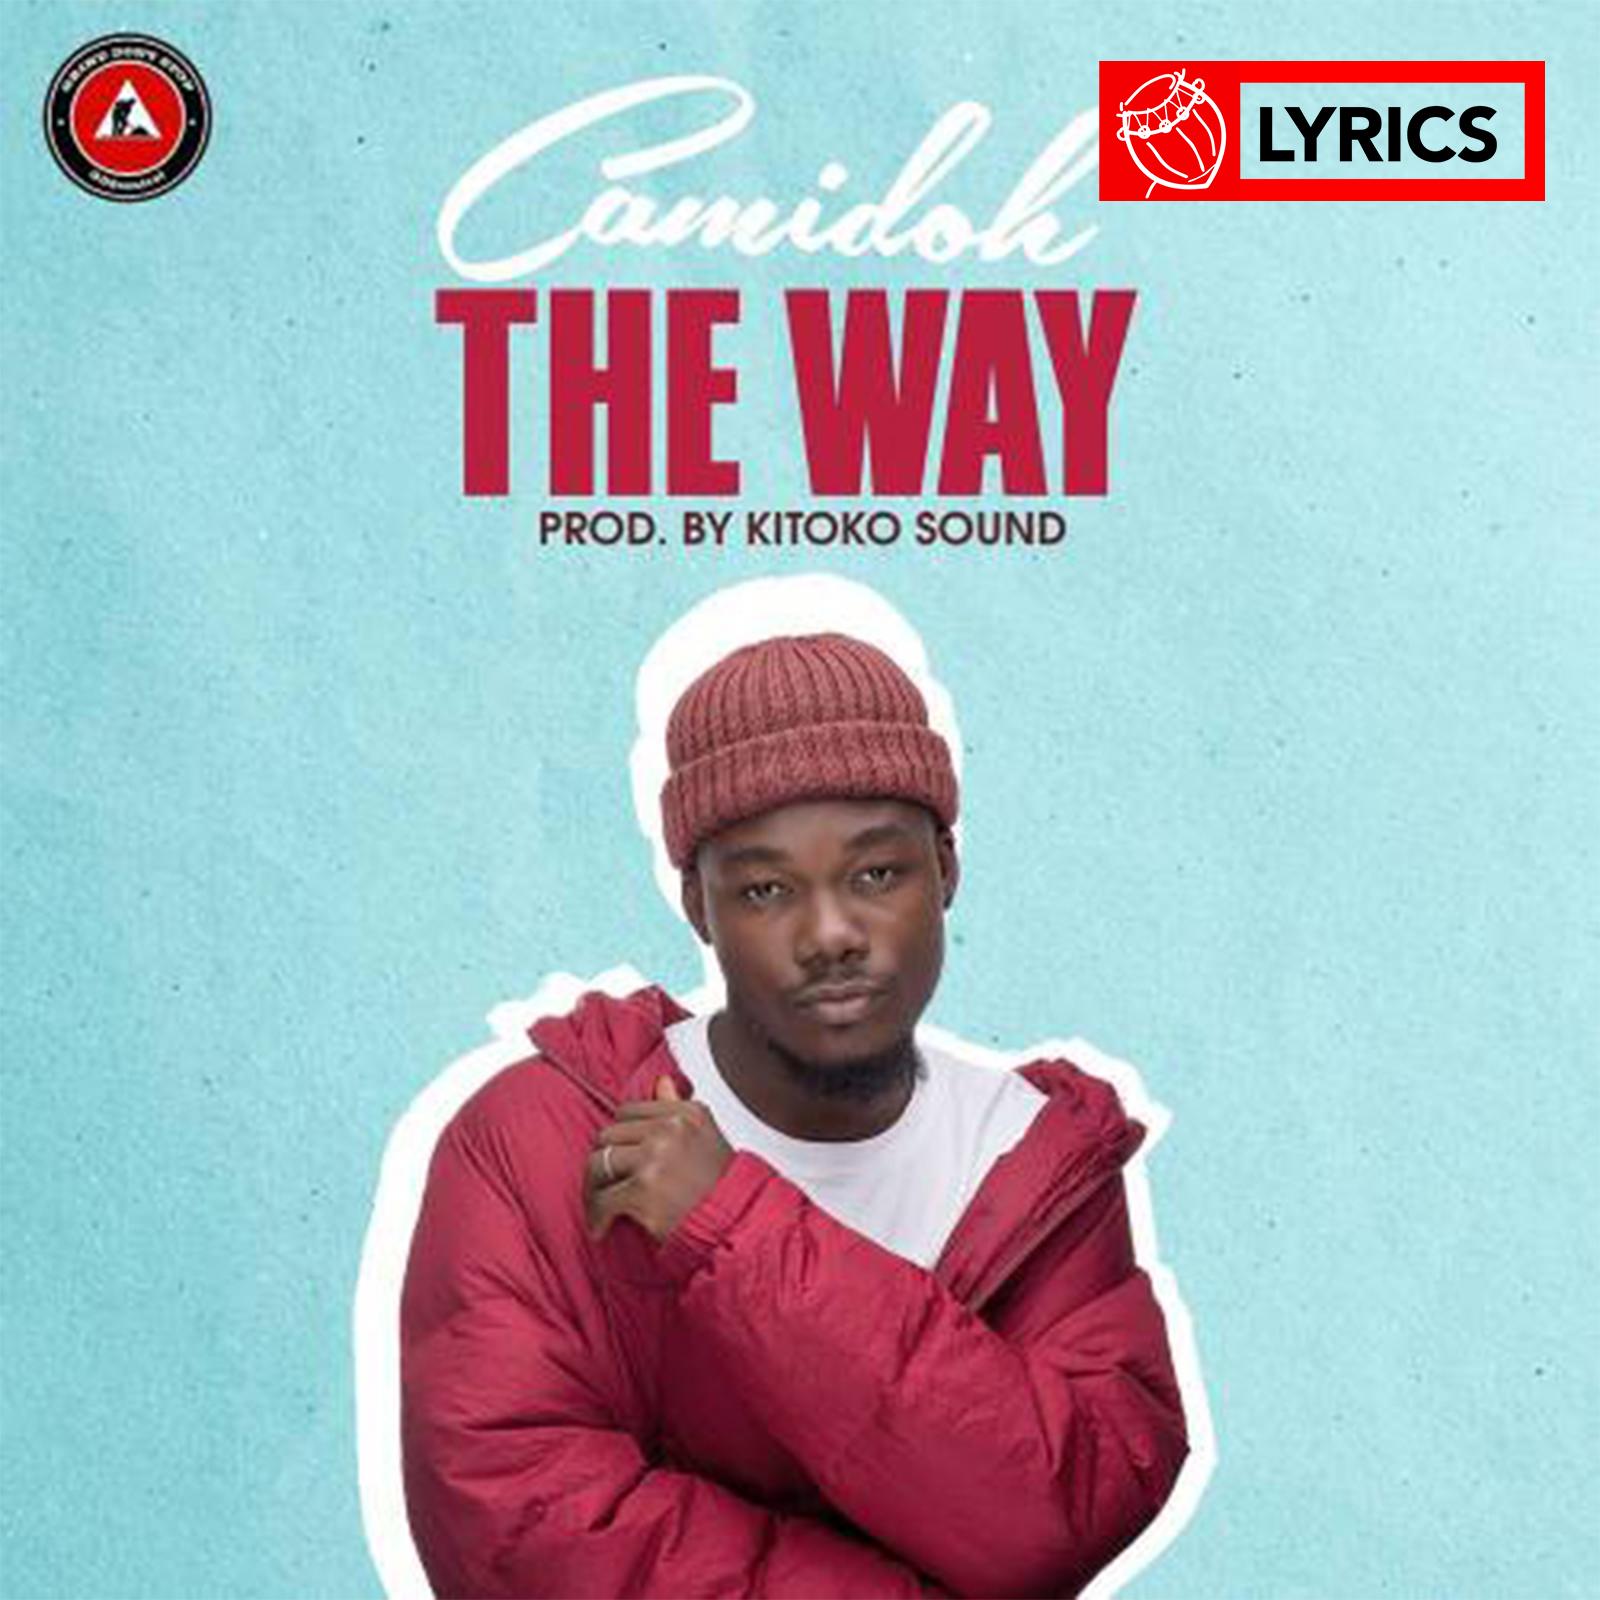 Lyrics: The Way by Camidoh